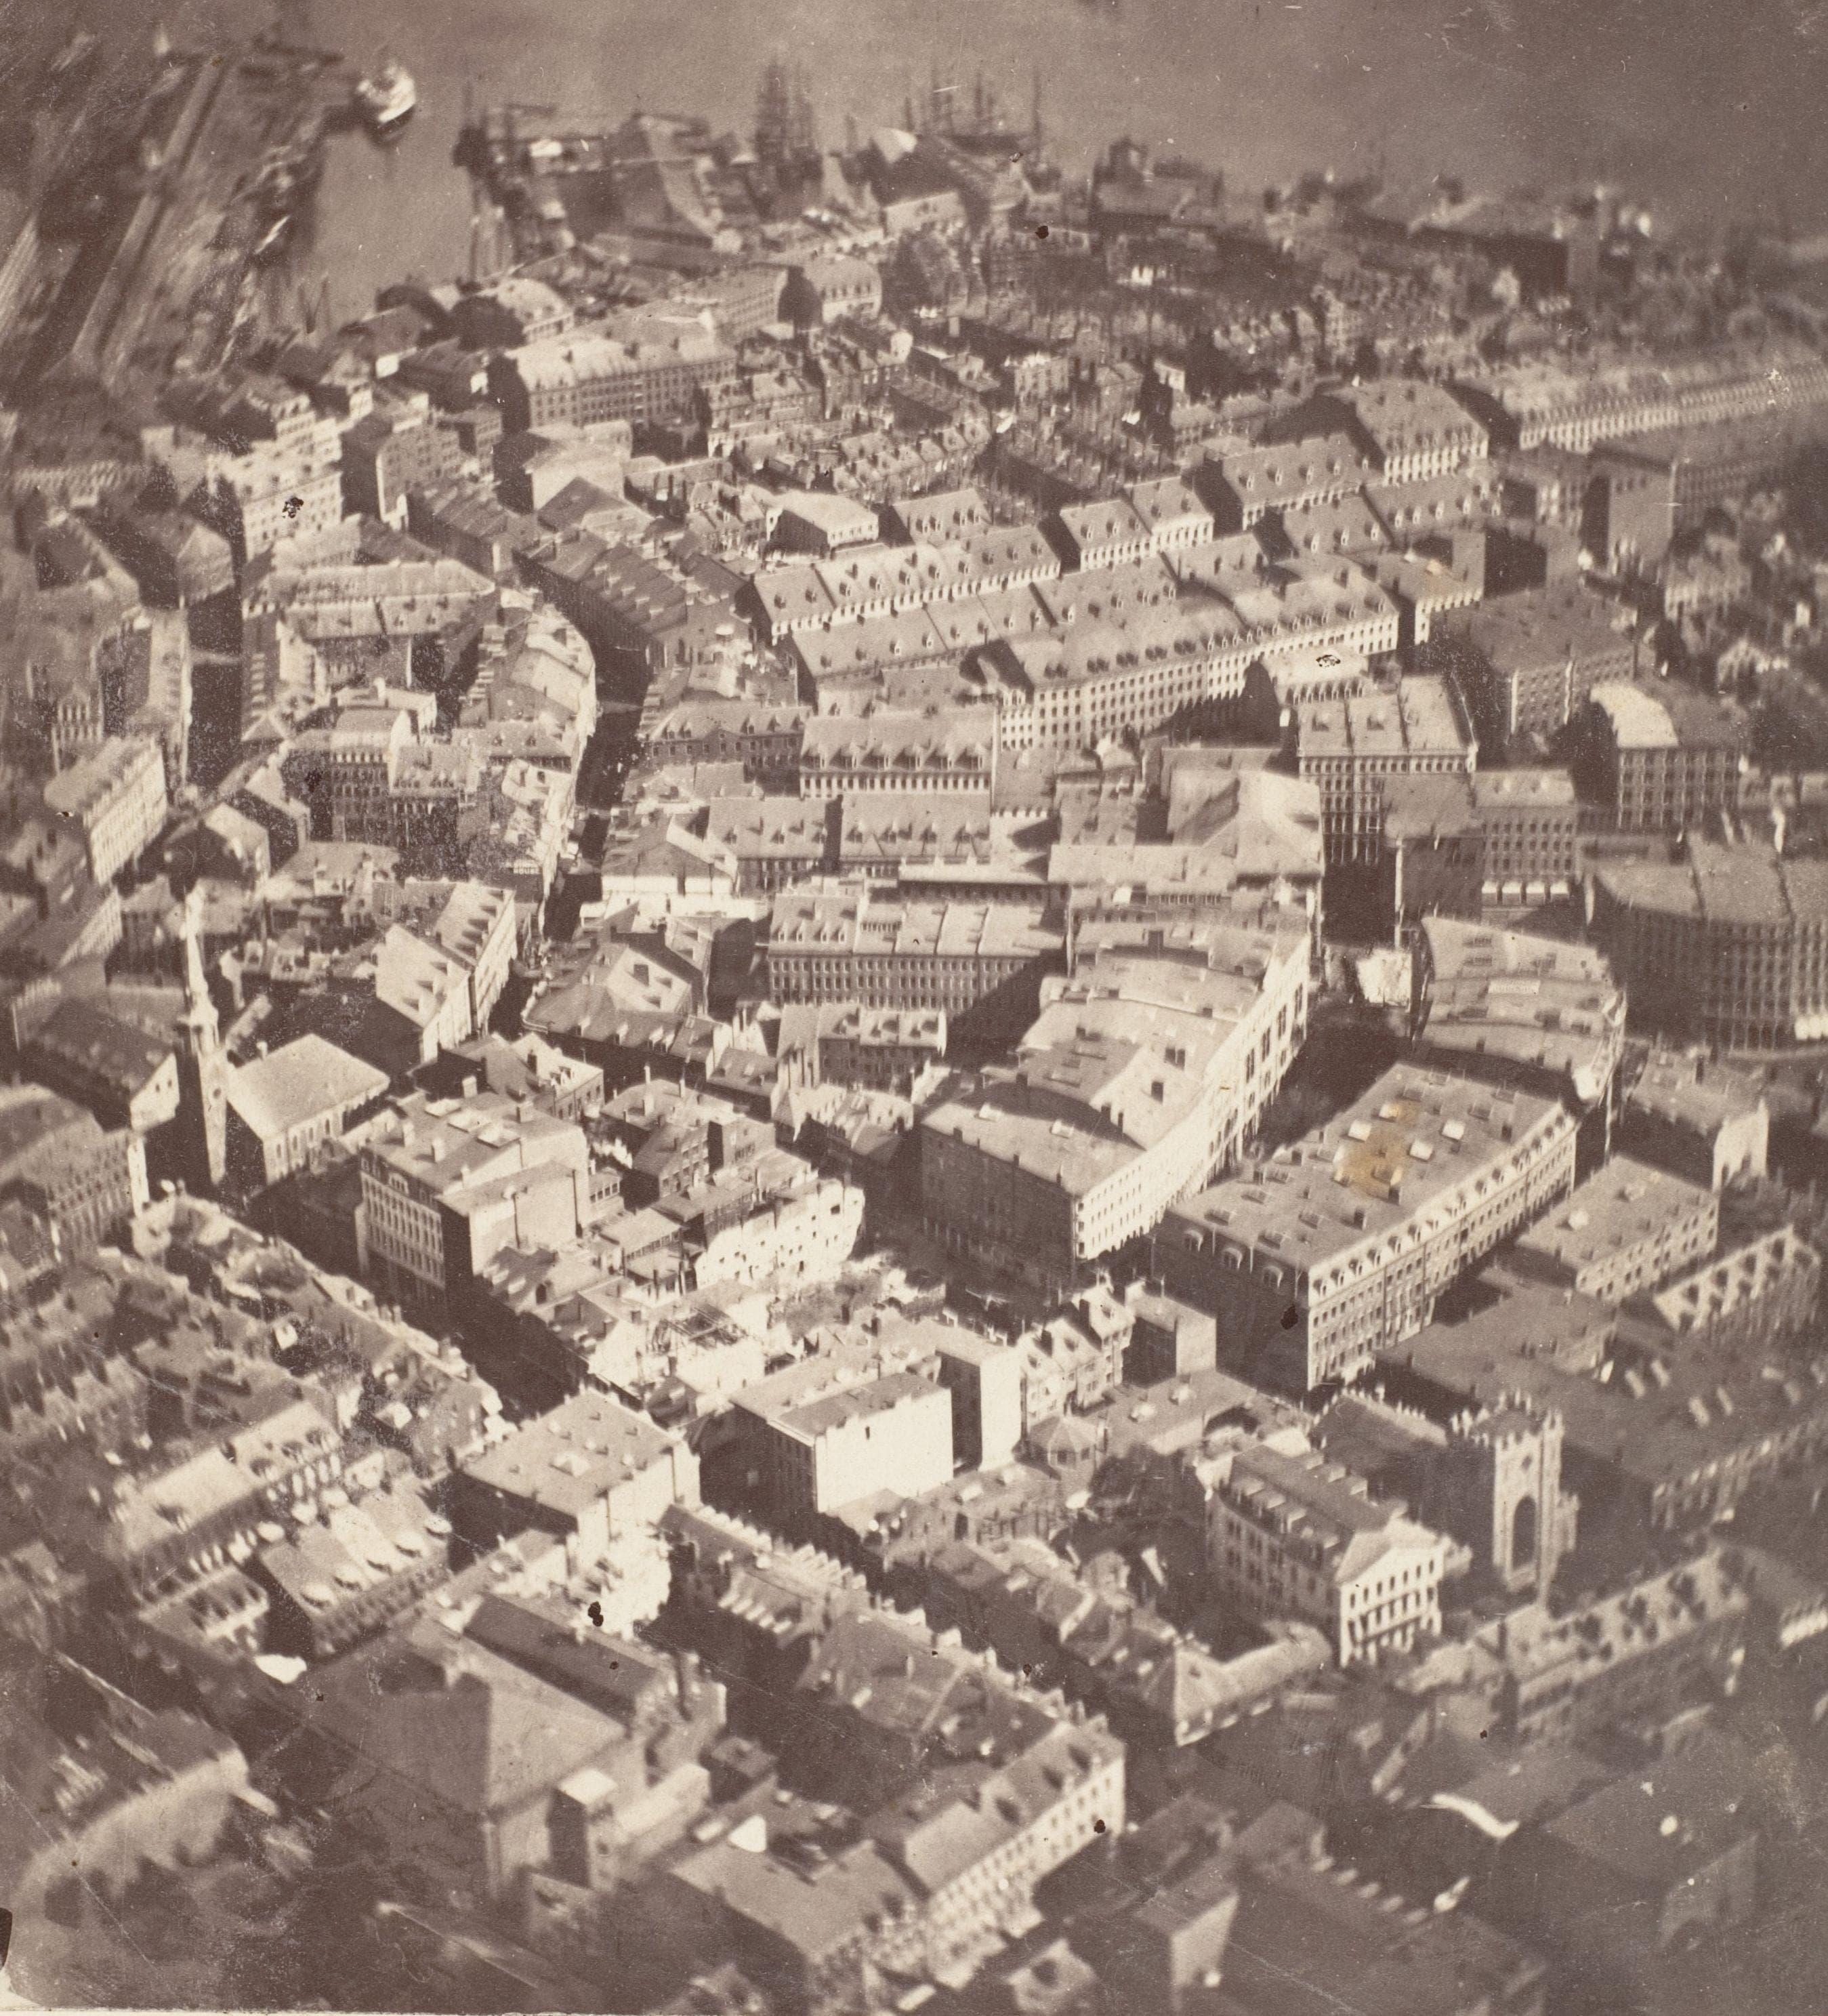 Random Stunning Aerial Photos of Early Cities